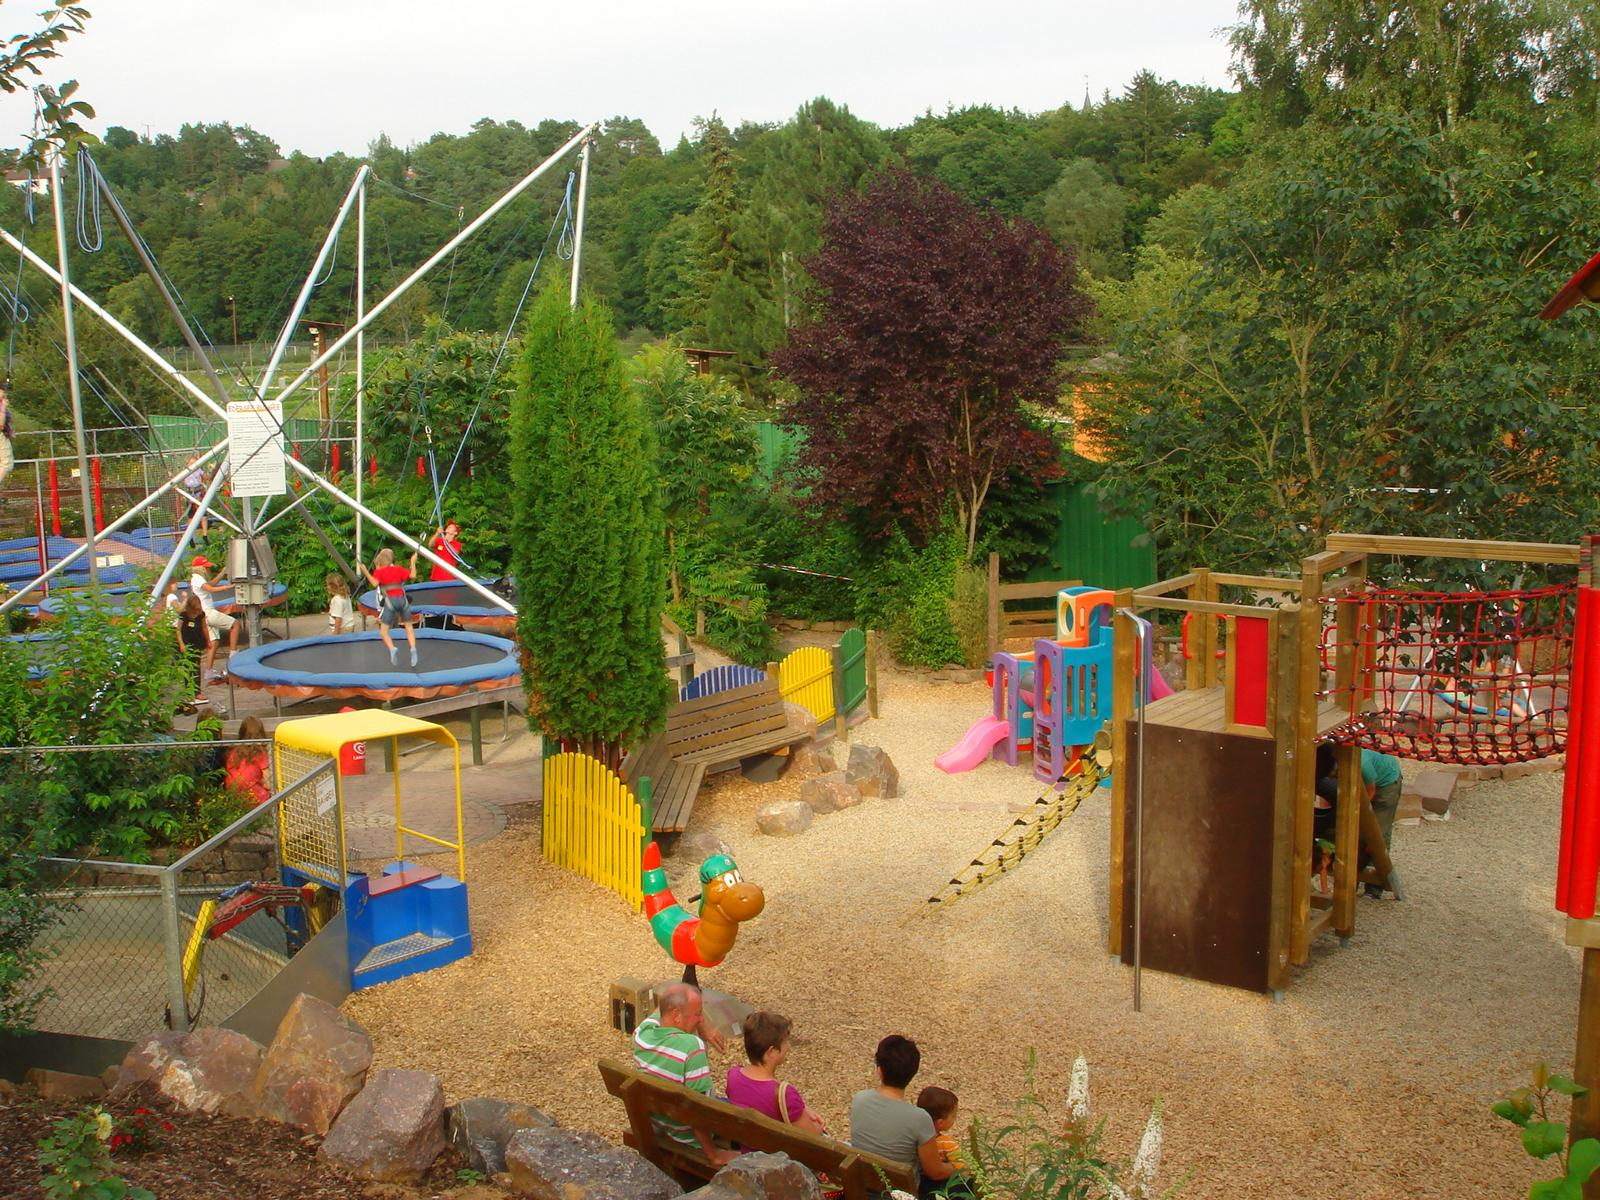 Klettergerüst Traktor : Spielplatz sommerrodelbahn edersee